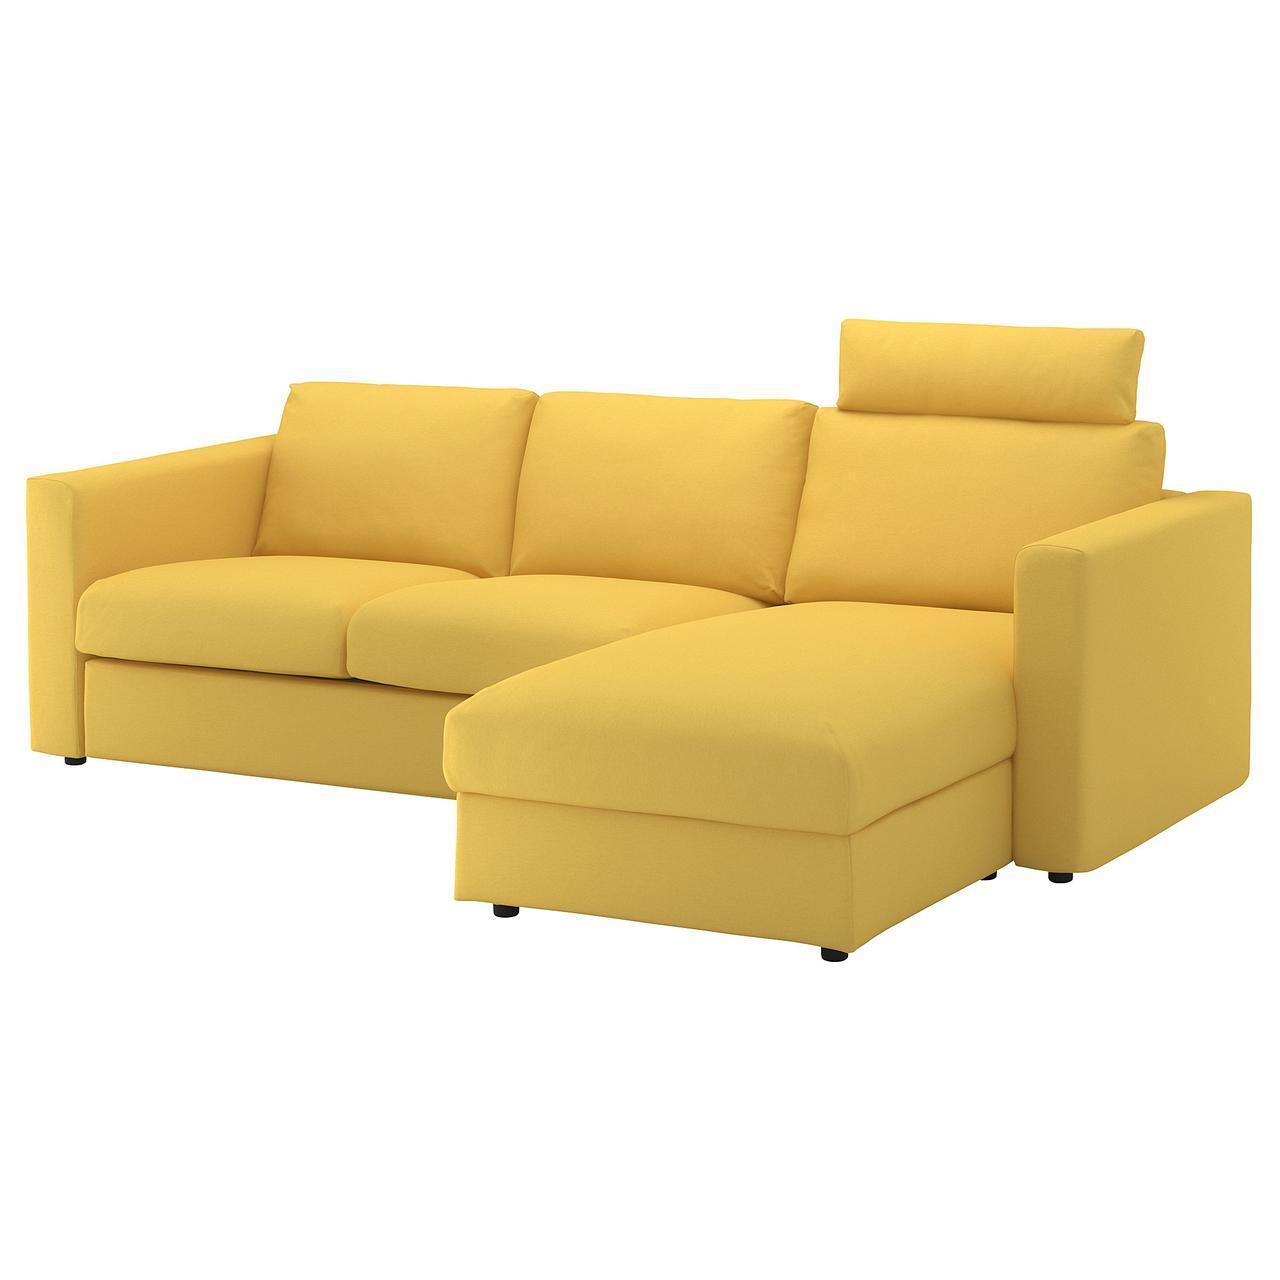 IKEA VIMLE (992.567.23) 3-местный диван, с шезлонгом